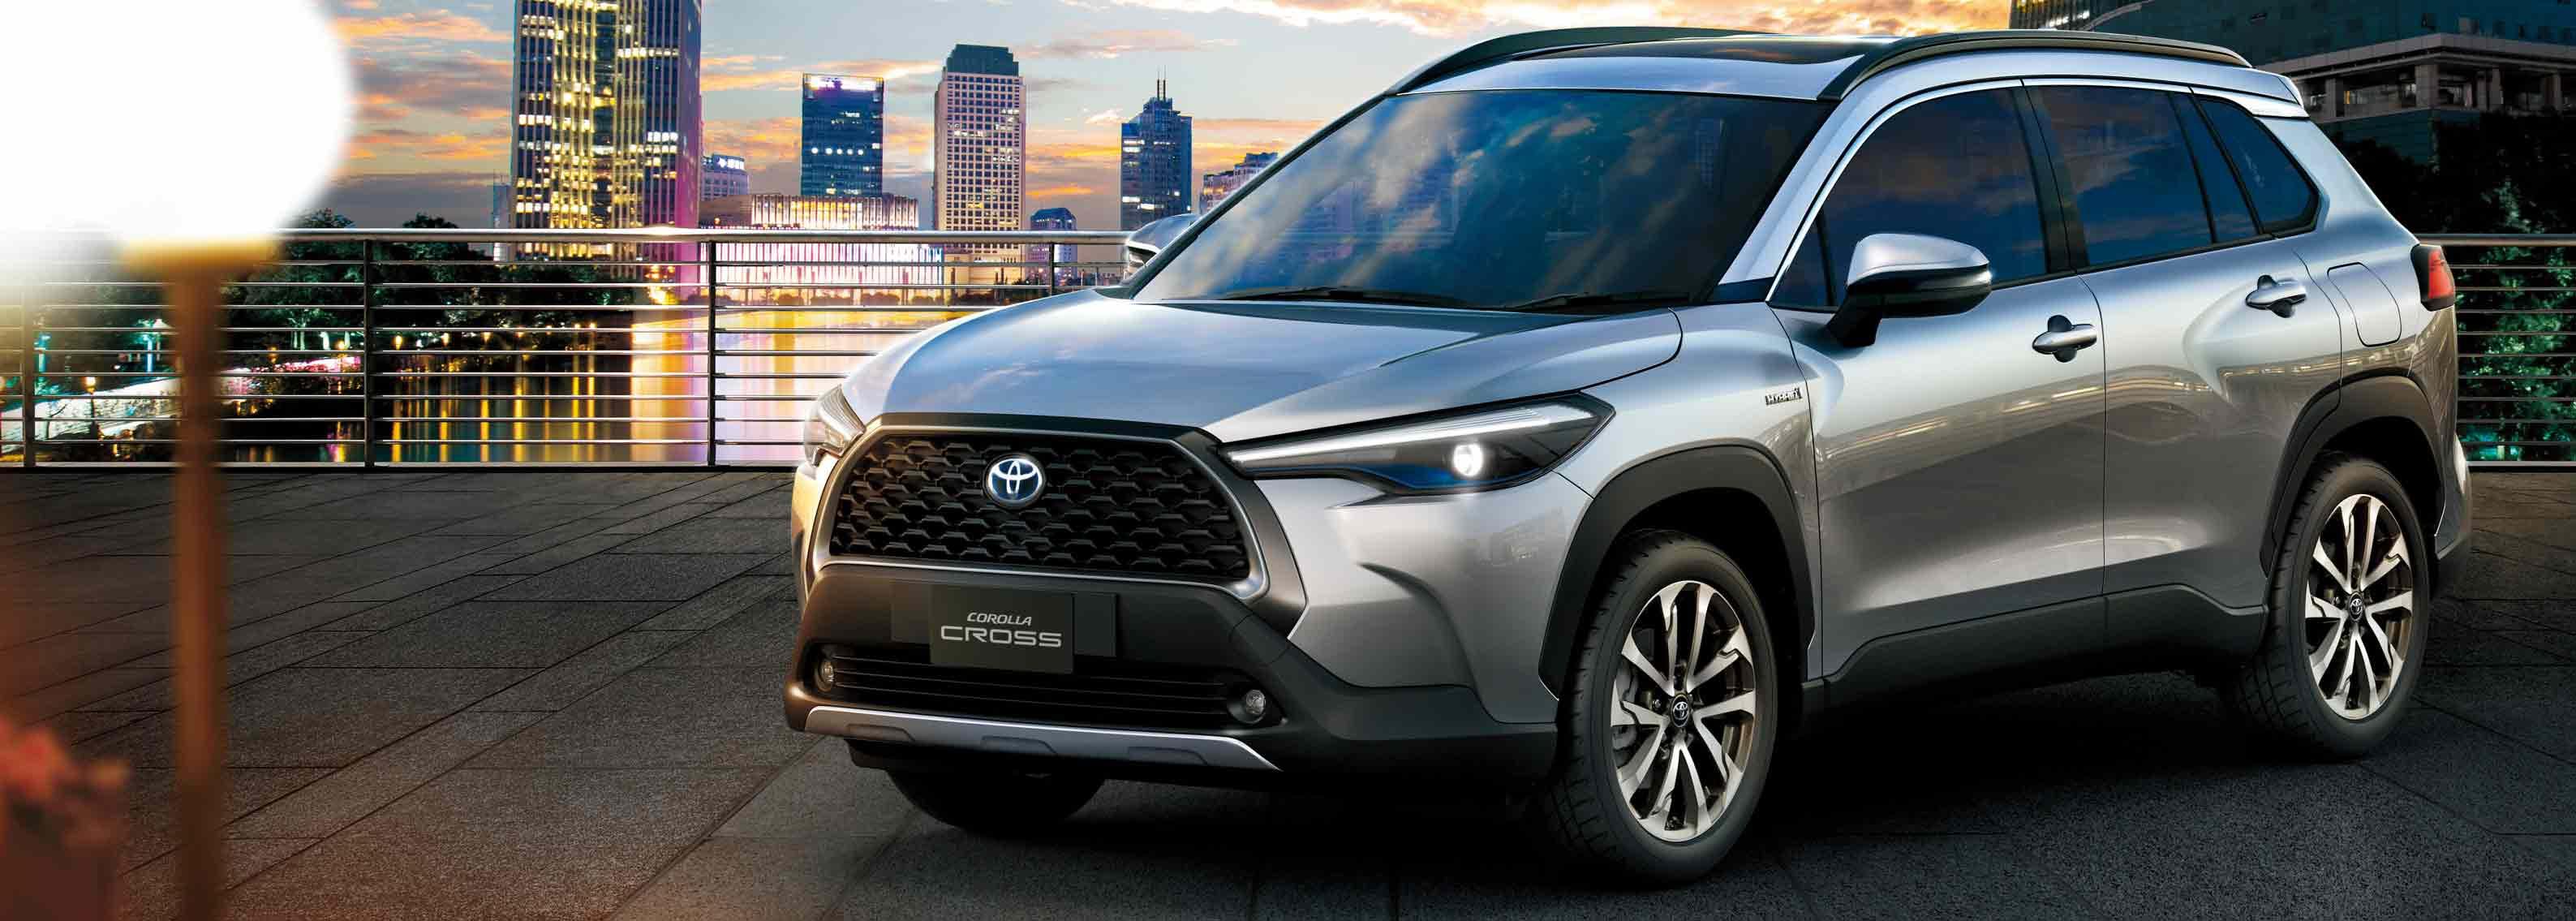 The Toyota Corolla Cross is on its way